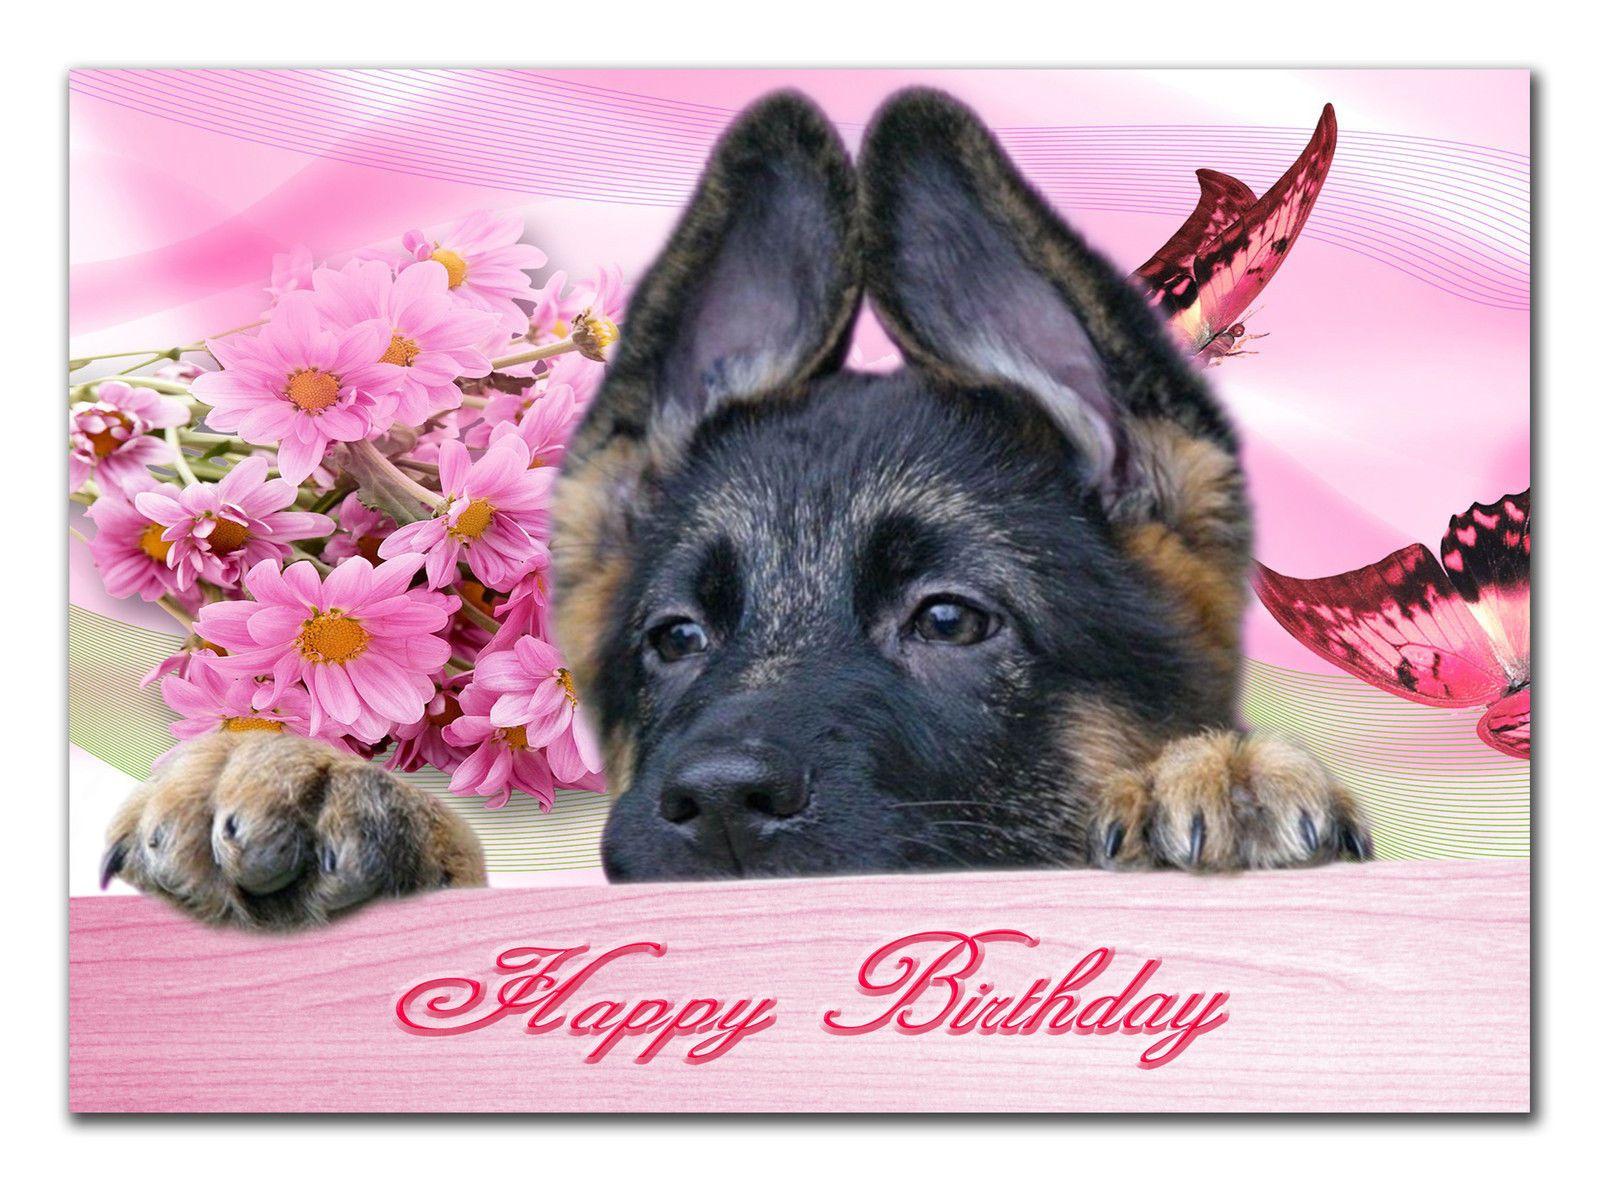 Картинки собаки овчарки спасибо за внимание, днем рождения